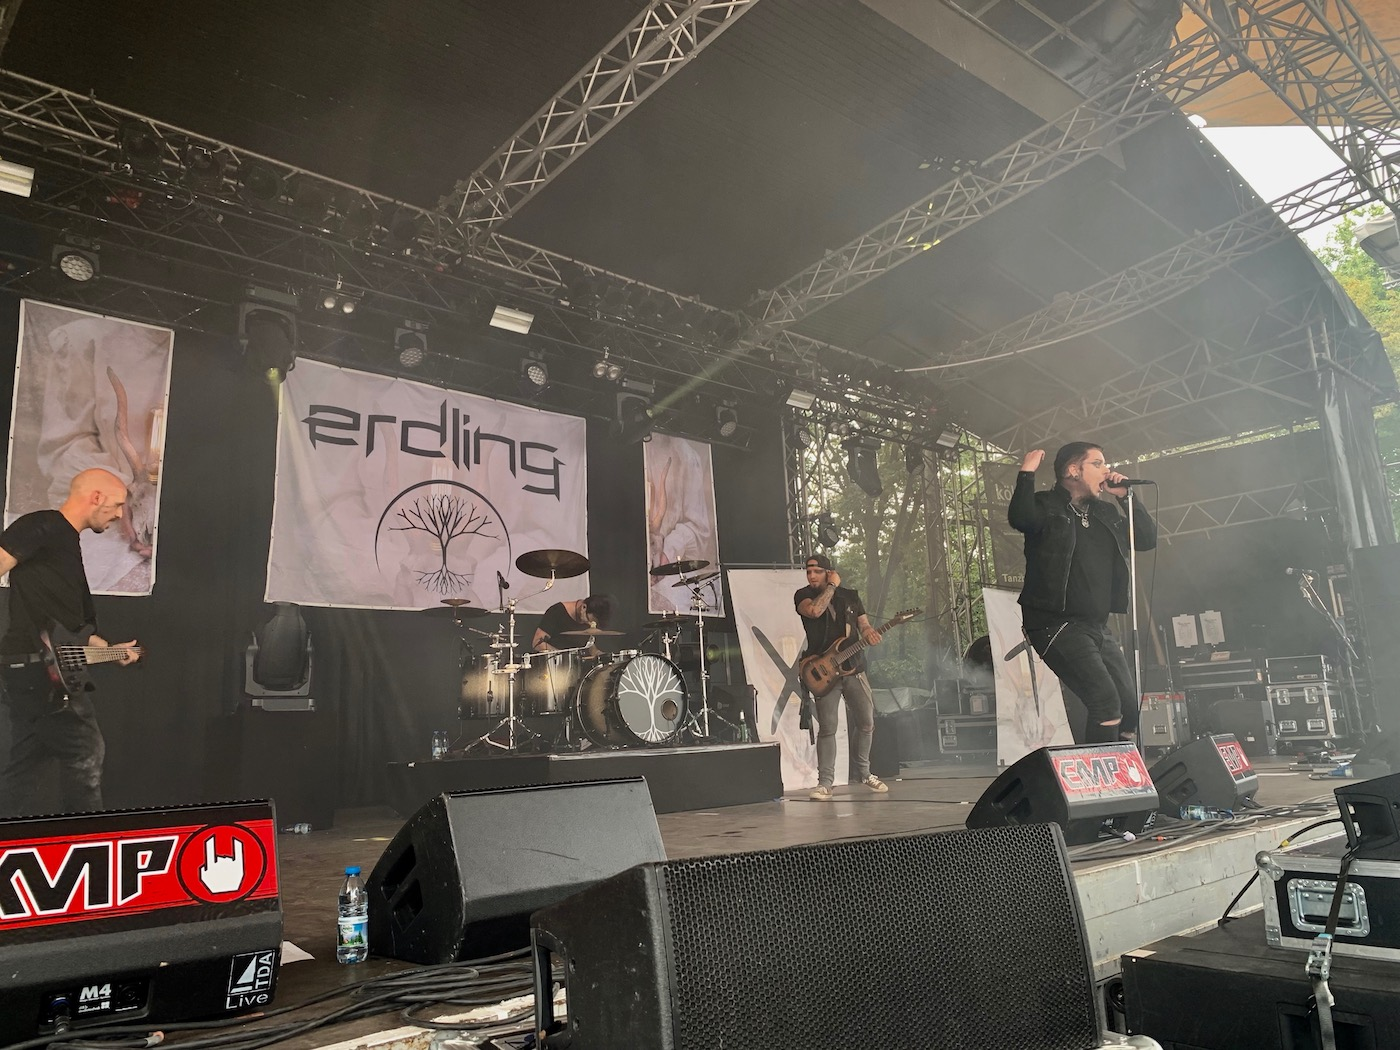 mark_benecke_amphi_festival_koeln_2019 - 15.jpg